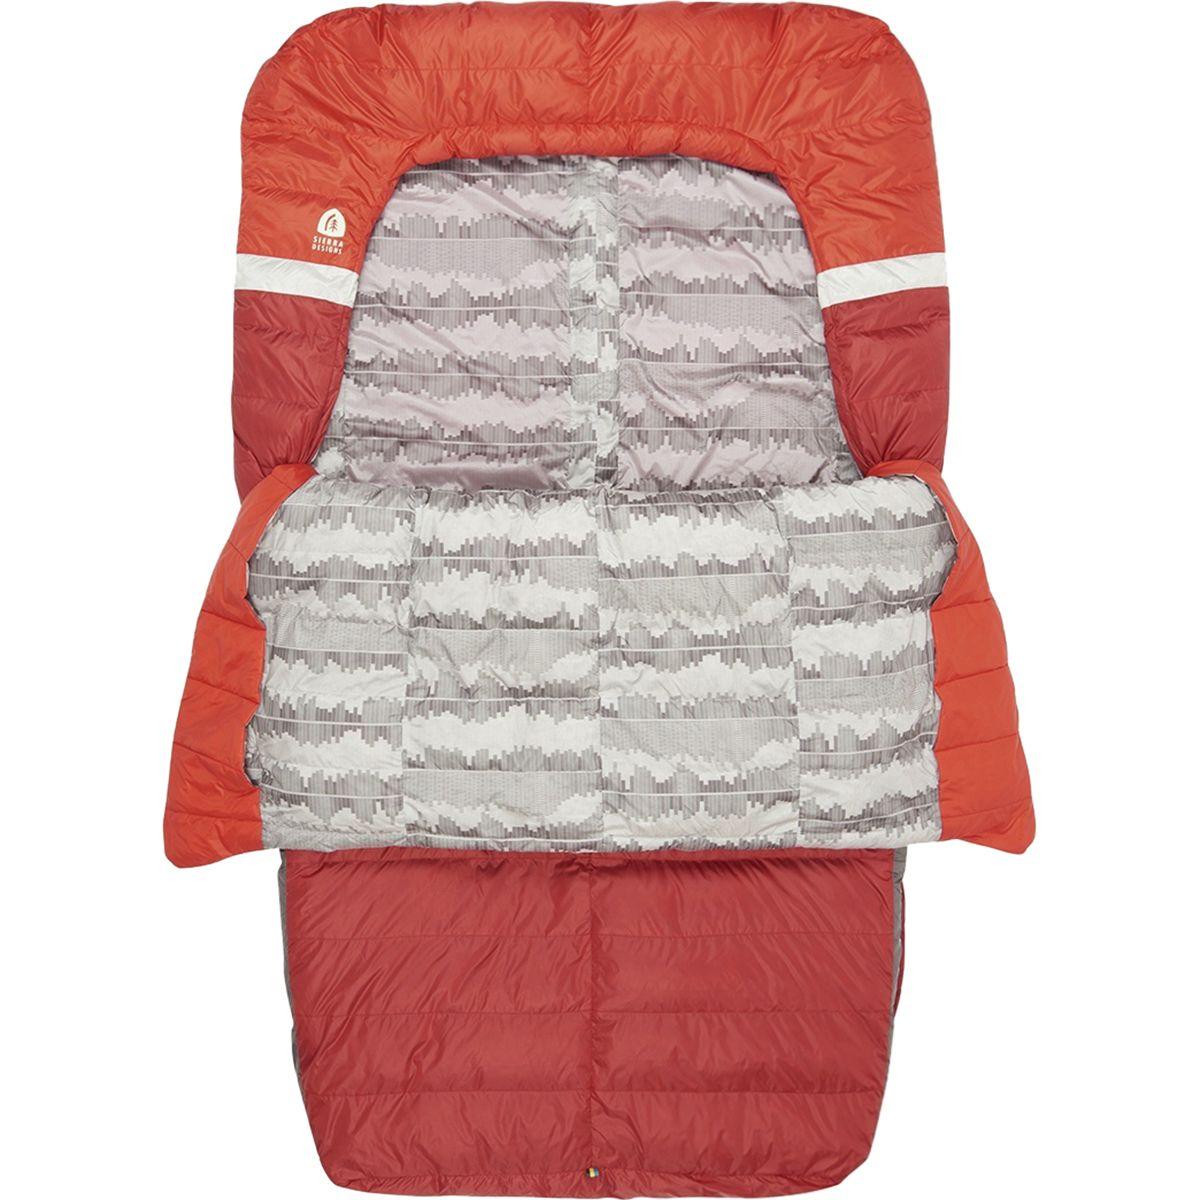 Sierra Designs Backcountry Bed Duo 20 / 700 DriDown